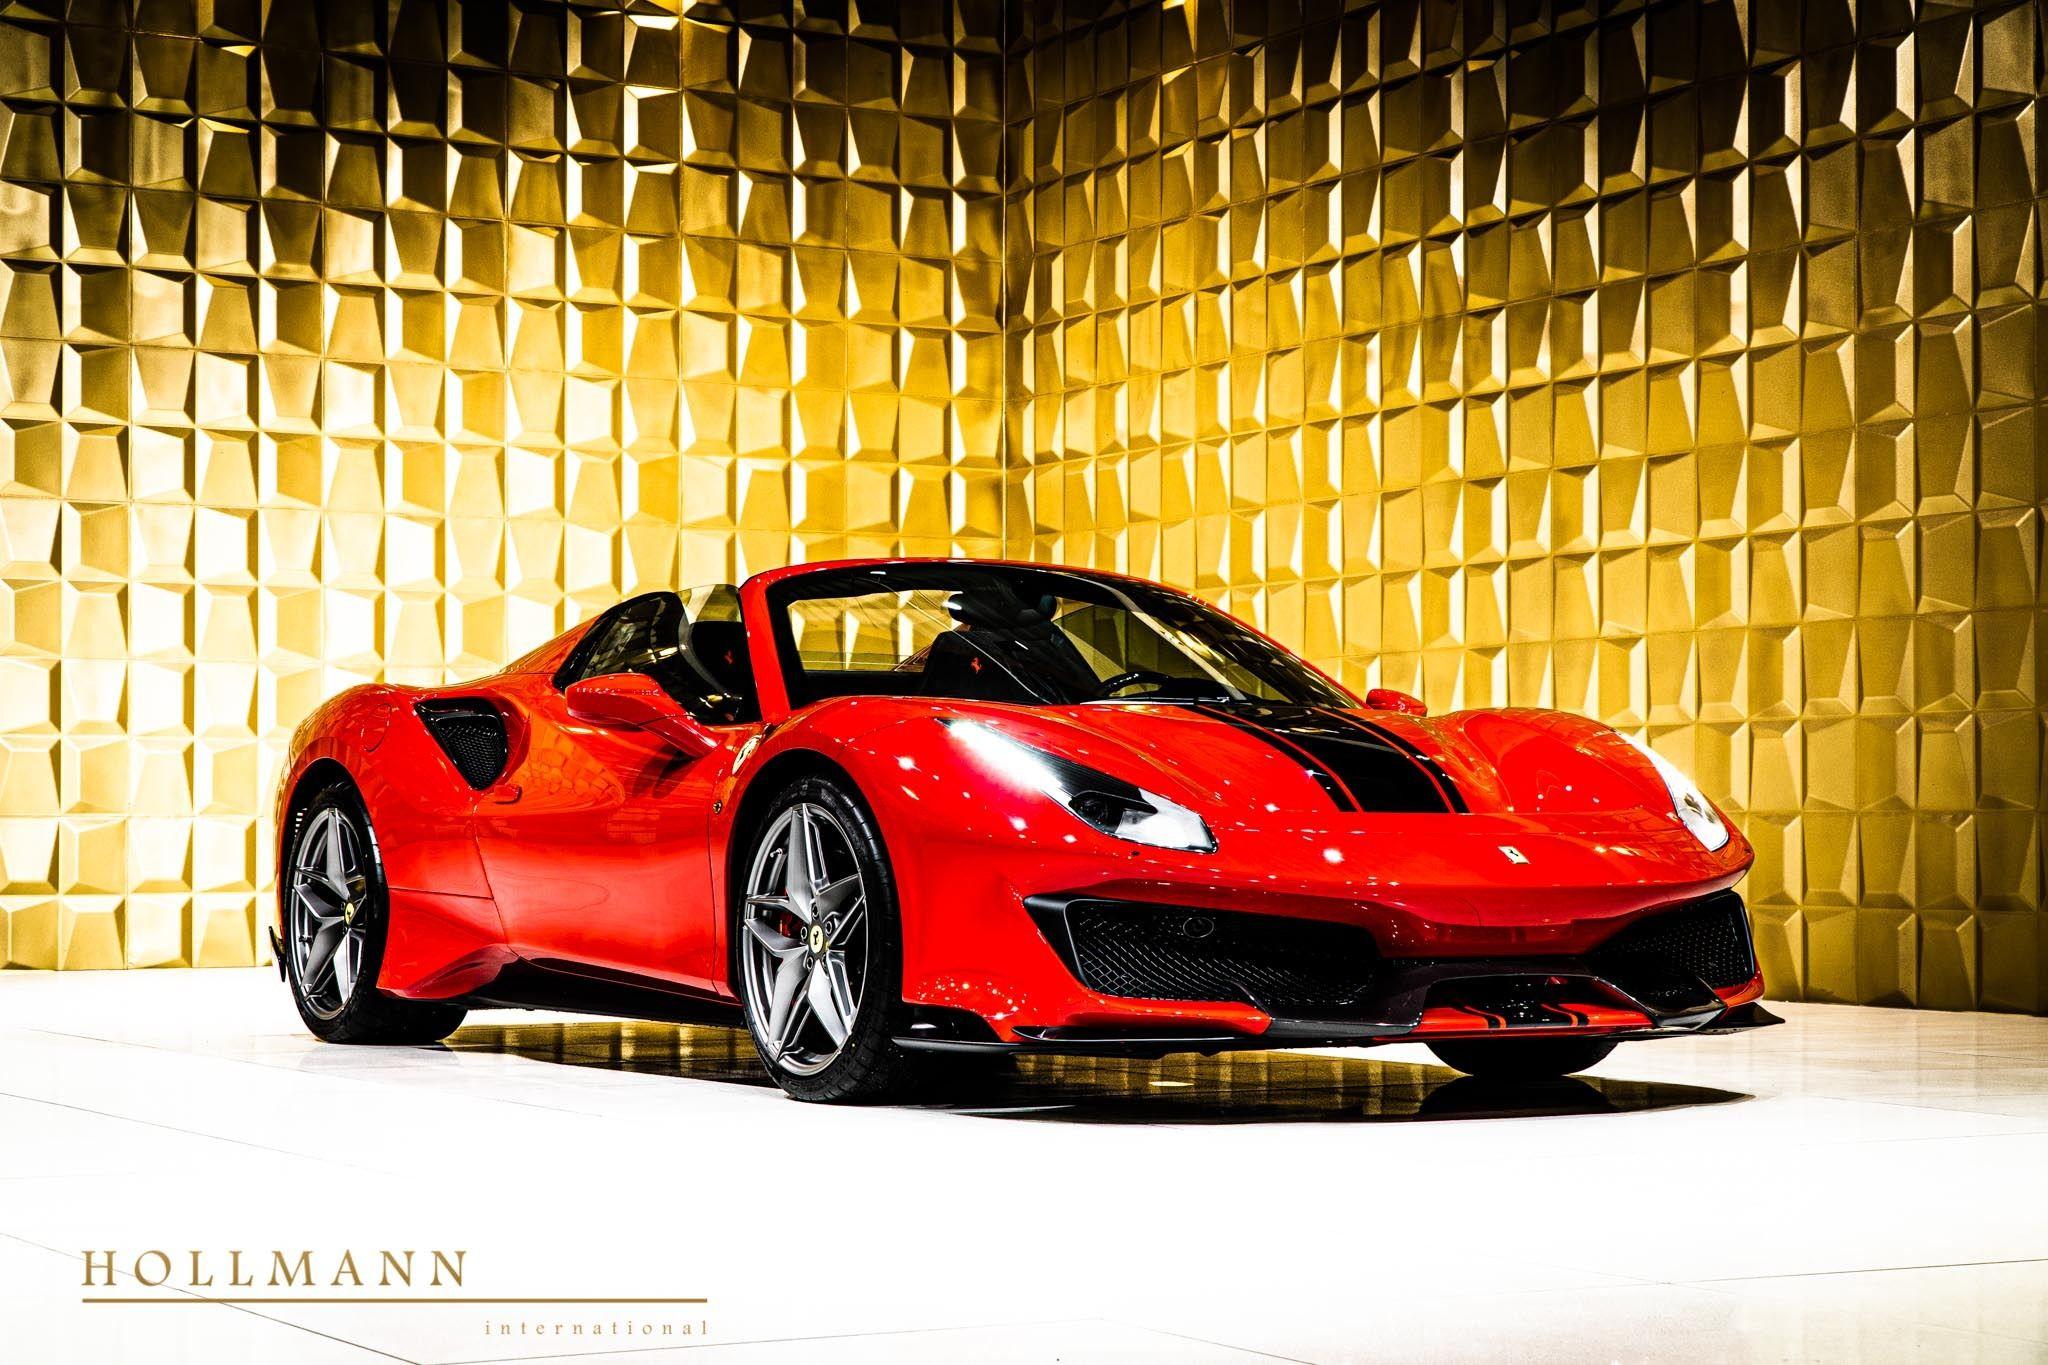 Ferrari 488 Pista Spider Hollmann International Germany For Sale On Luxurypulse